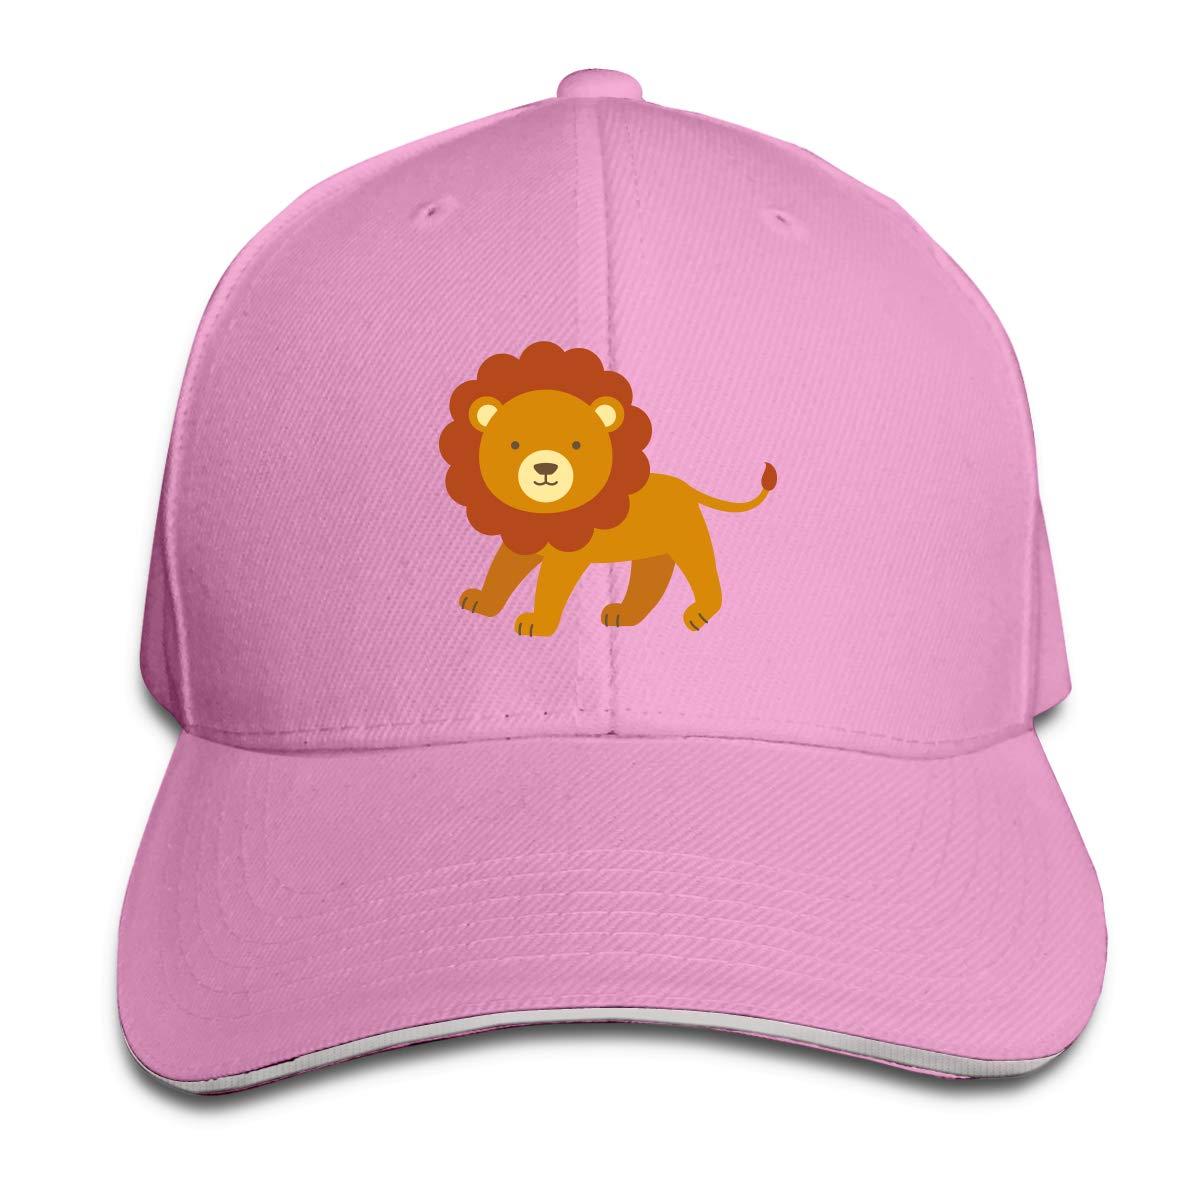 WFIRE Adult Baseball Caps Cute Lion Custom Adjustable Sandwich Cap Casquette Hats